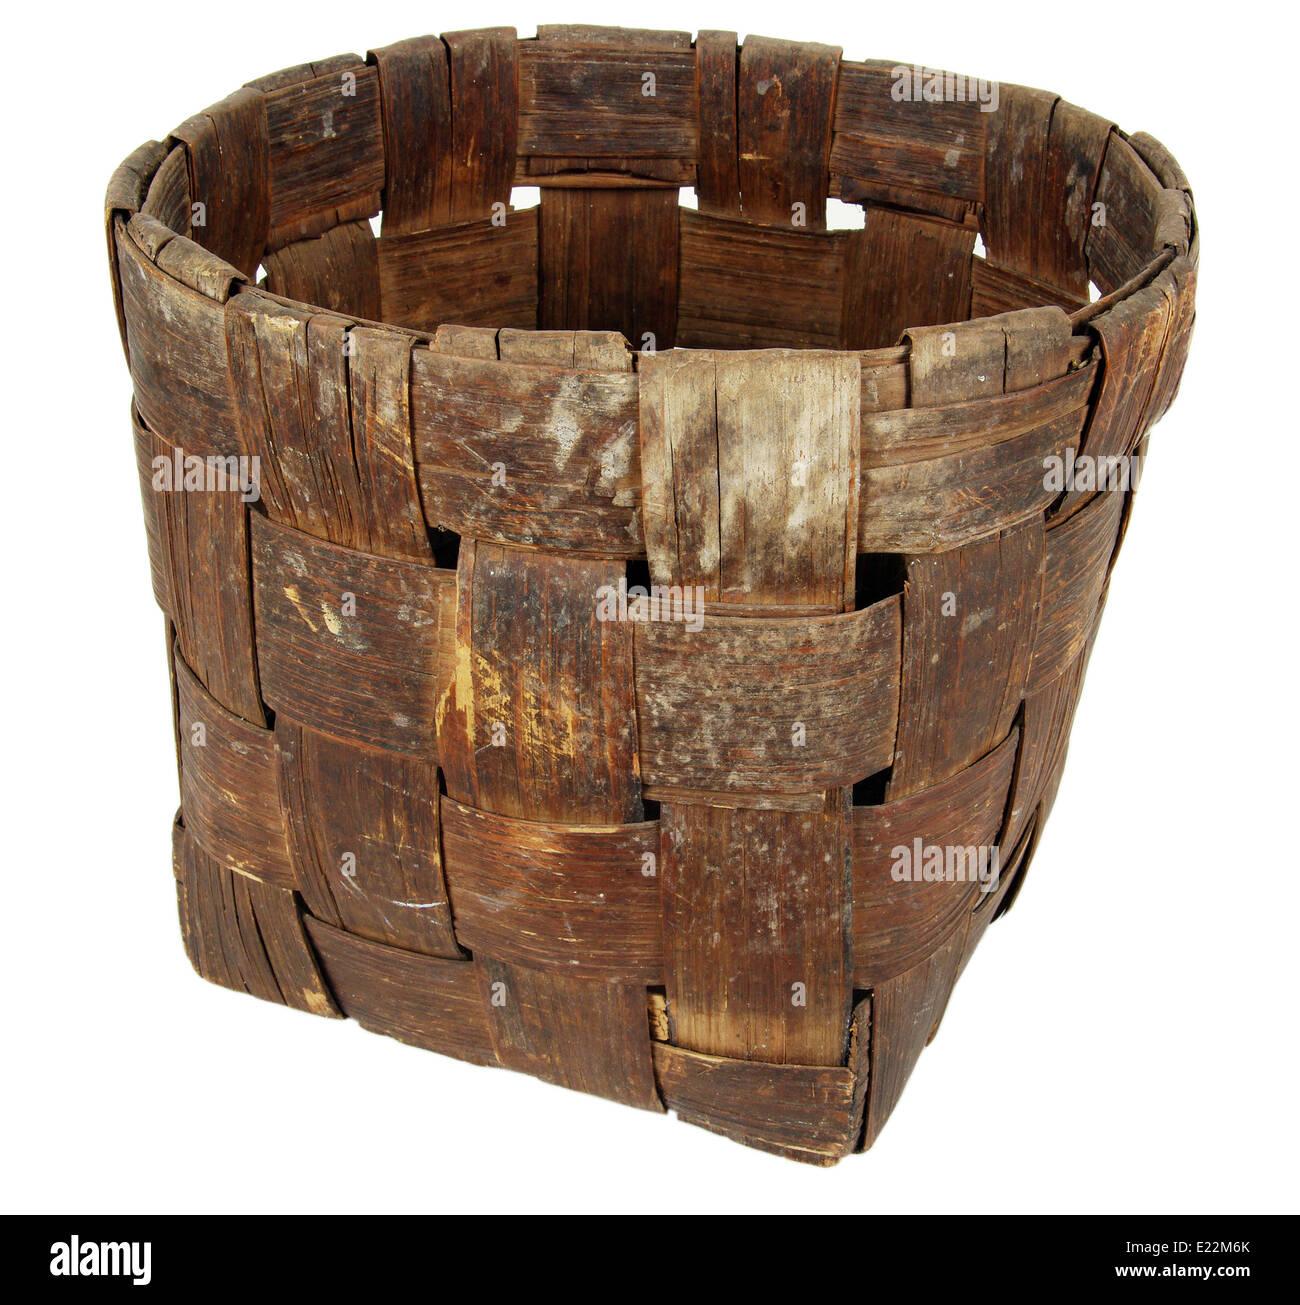 Background, bark, basket, bast, birch, craft, interlacing, national, product, weaving - Stock Image